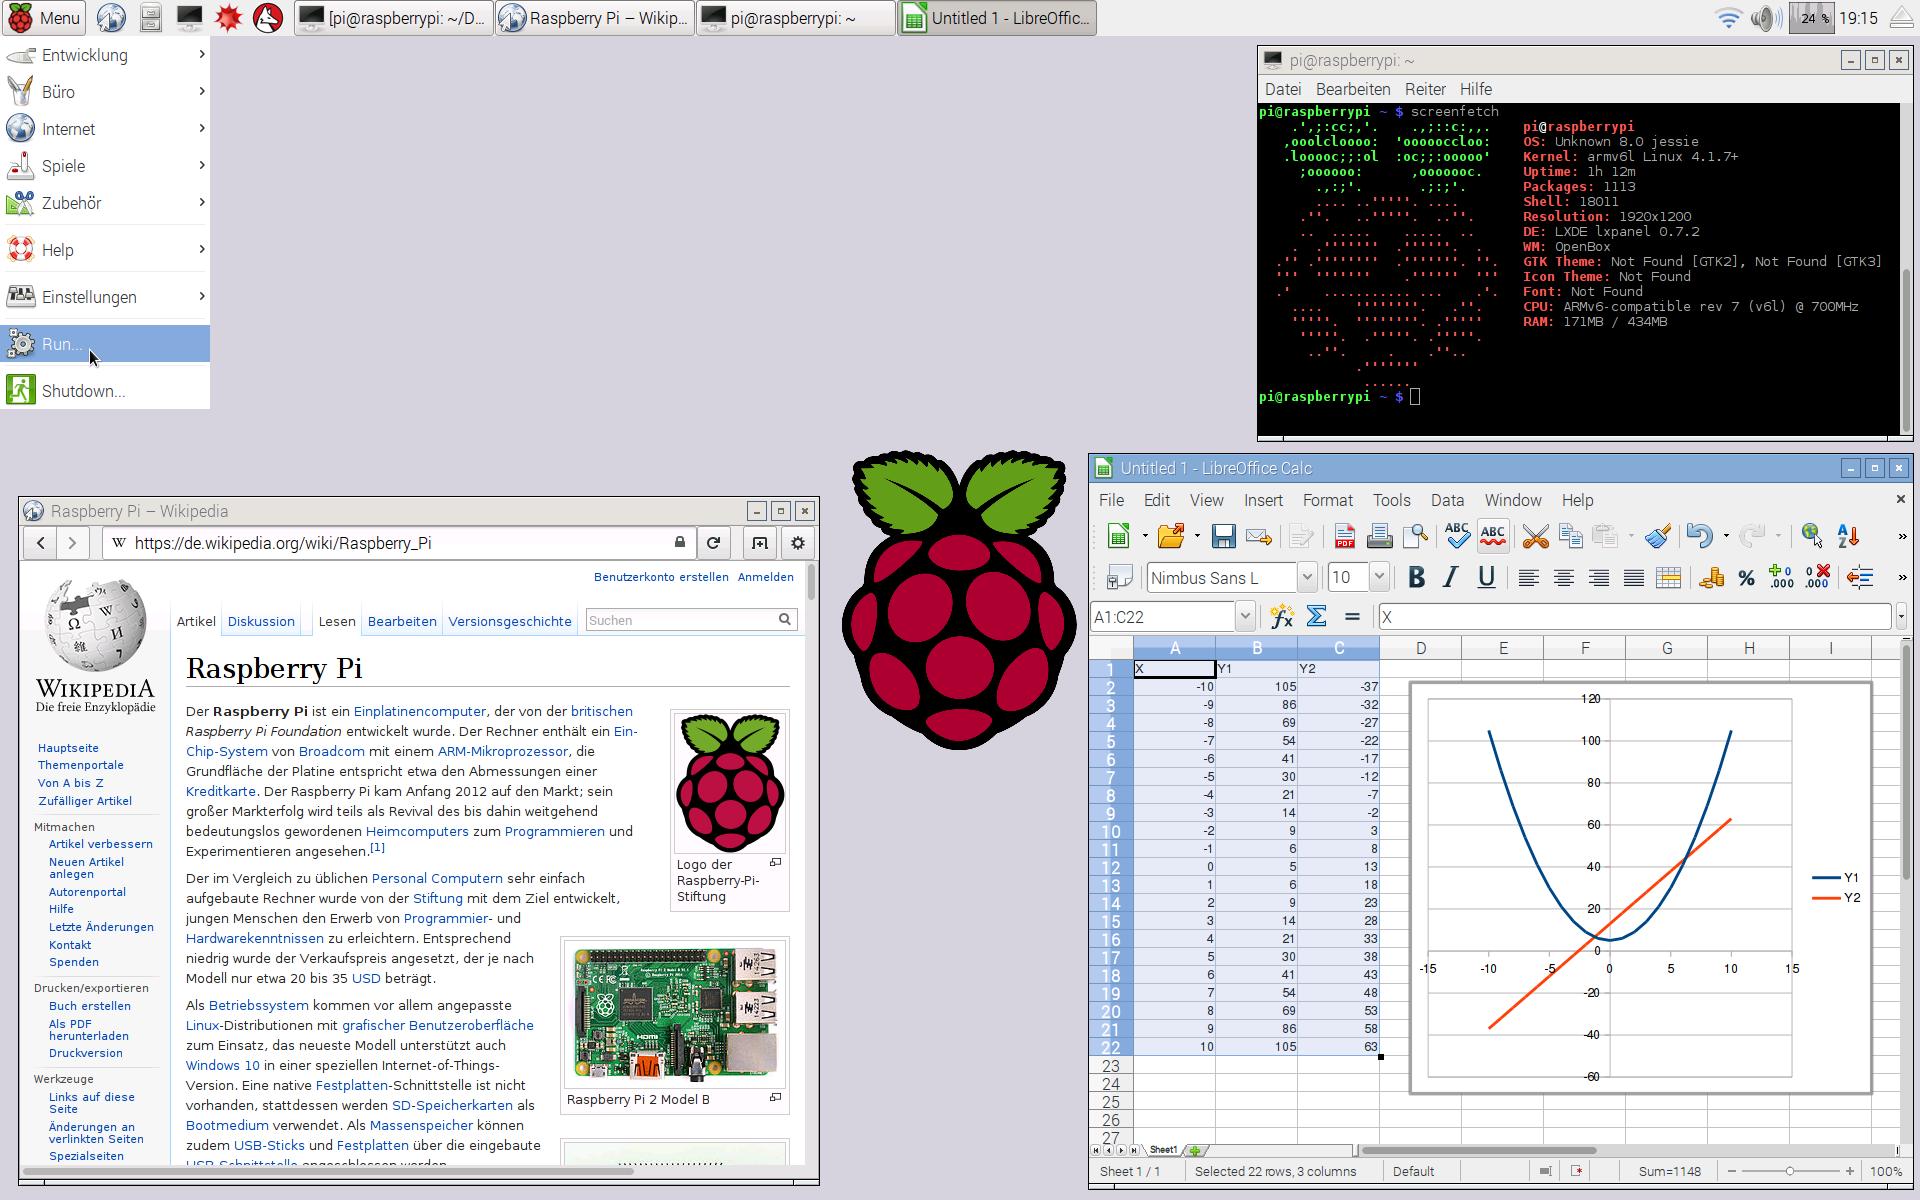 File:Raspbian-Desktop Version 2015-09-25.png - Wikipedia